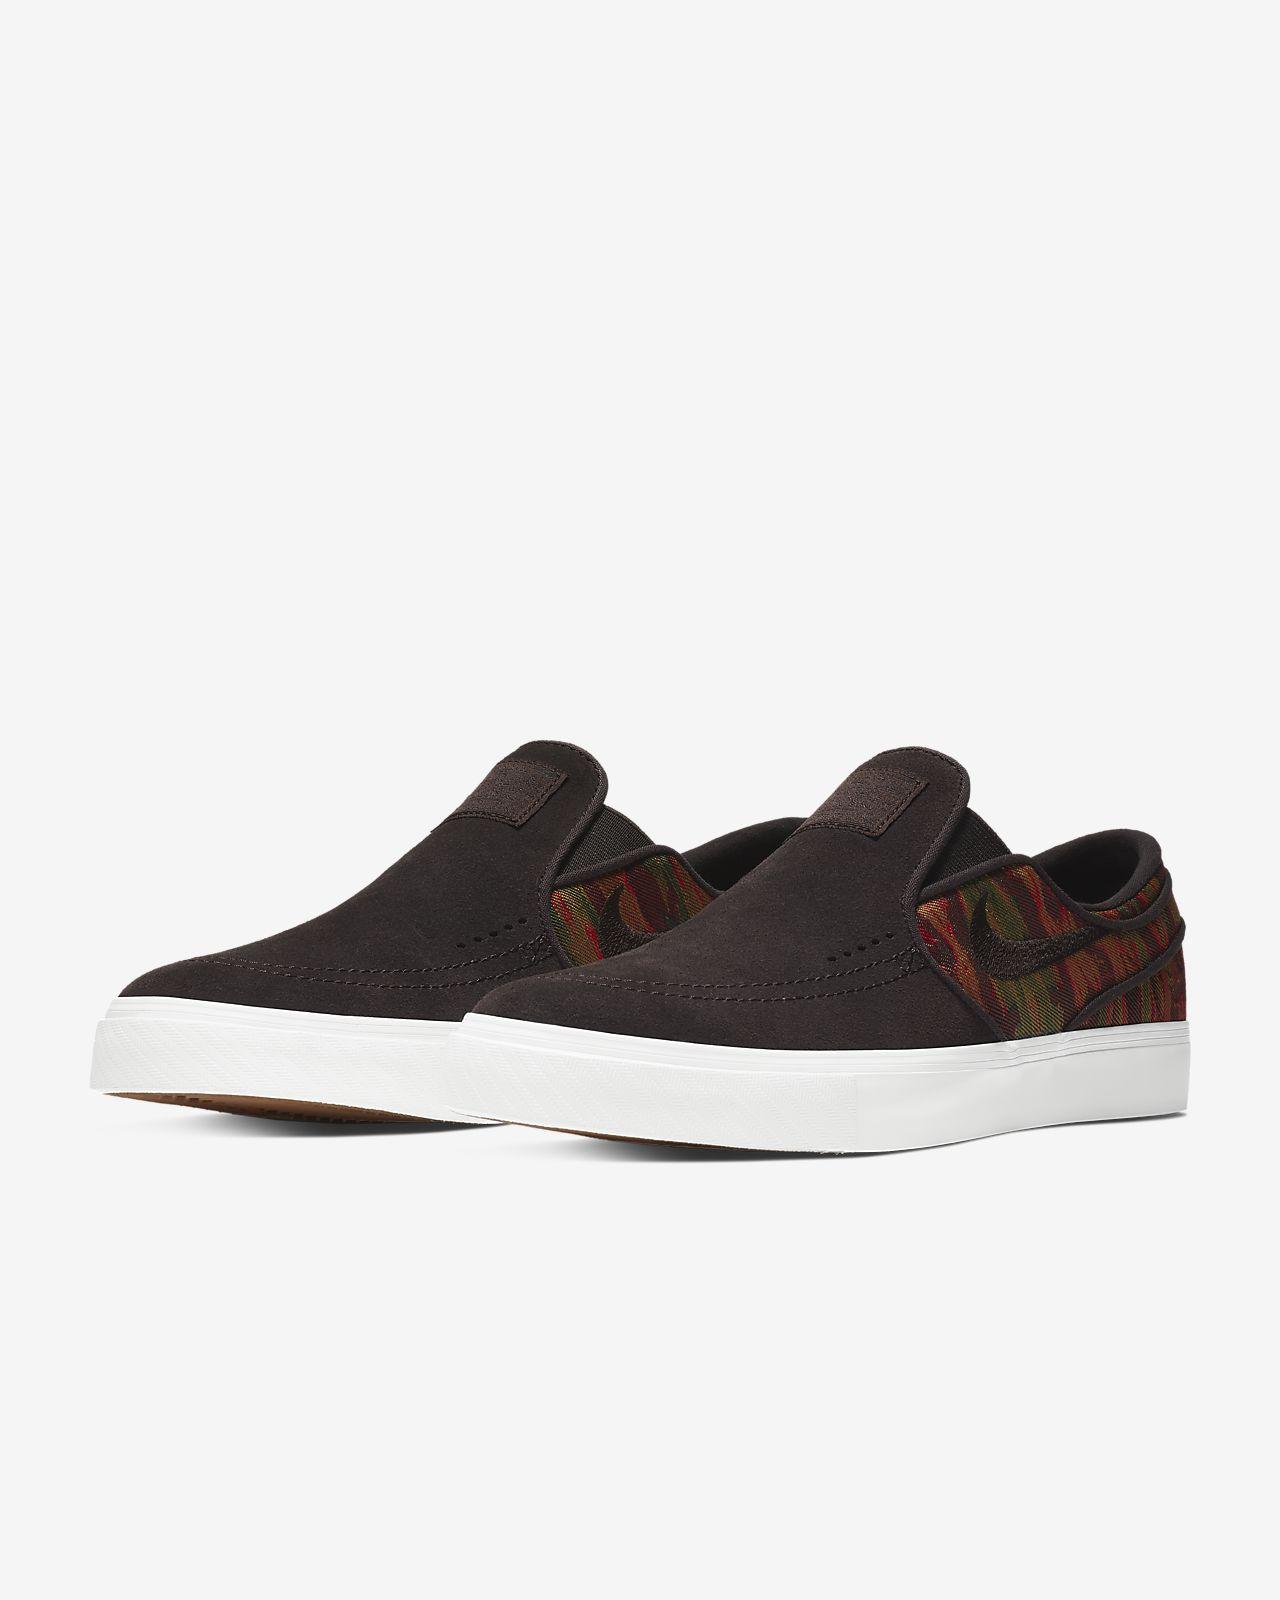 super cute a1cfc 086f1 ... Nike SB Zoom Stefan Janoski Slip-On Premium Men s Skateboarding Shoe